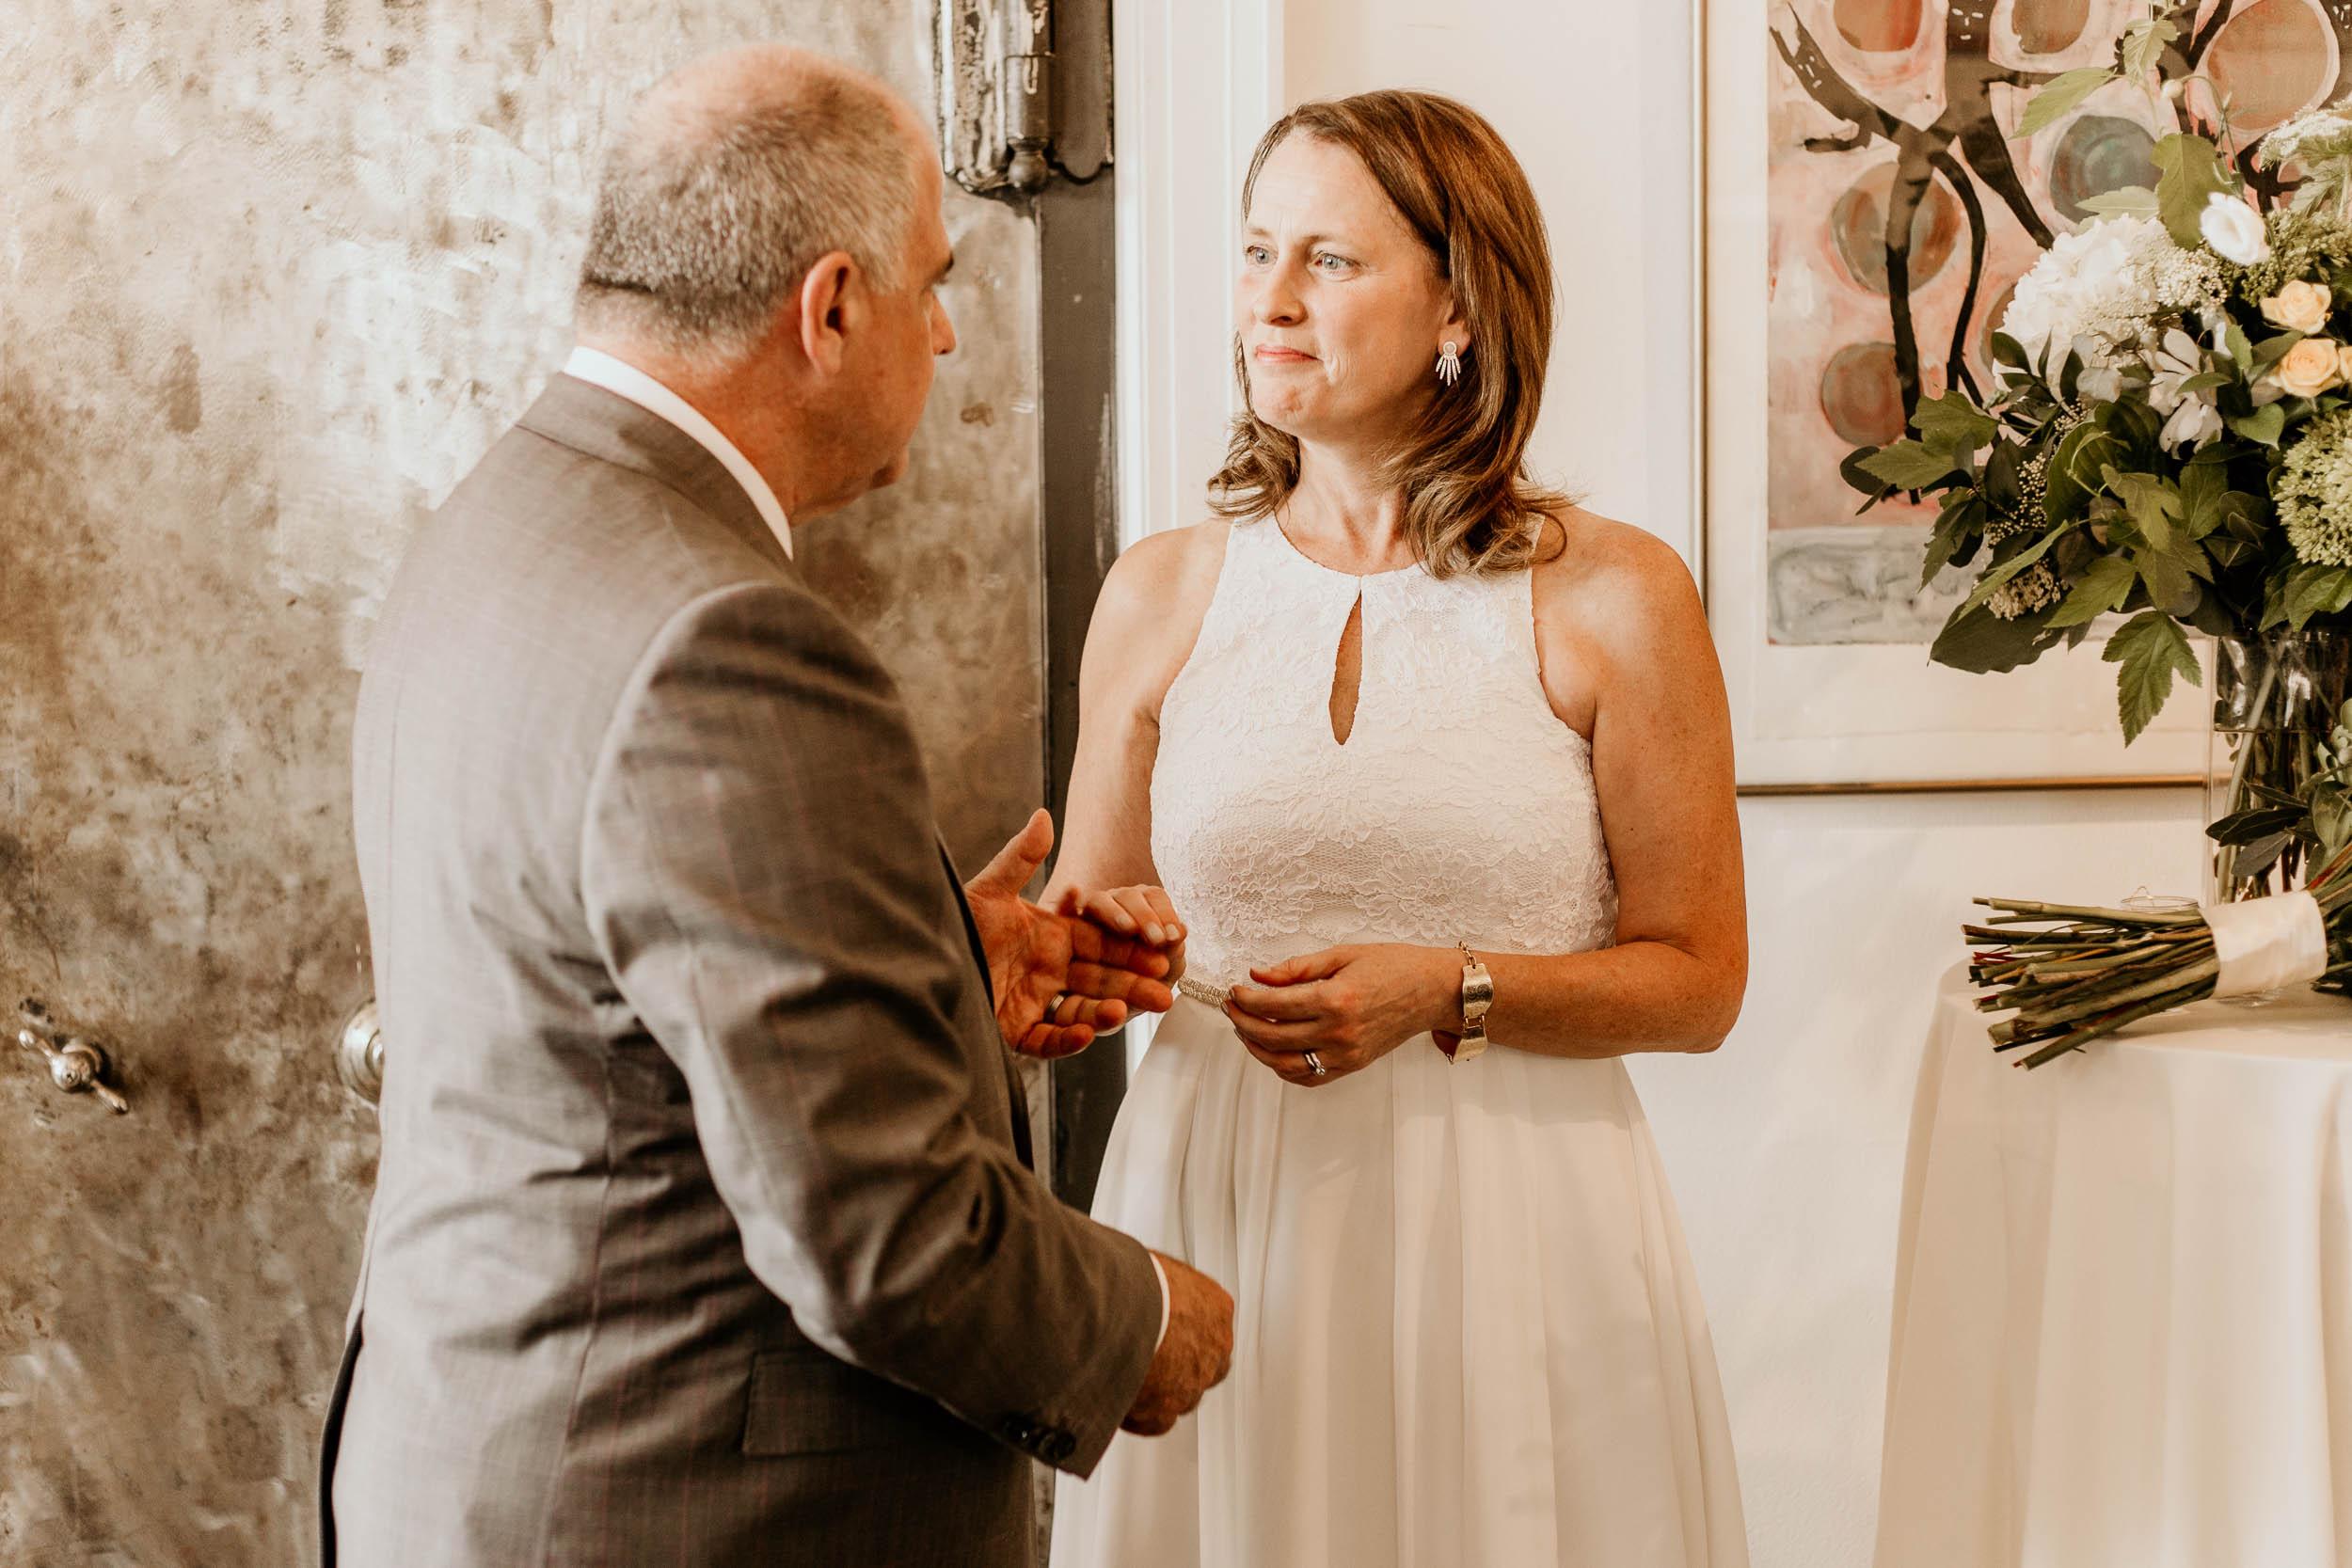 elopement-engagement-photographer-ottawa-4390.jpg